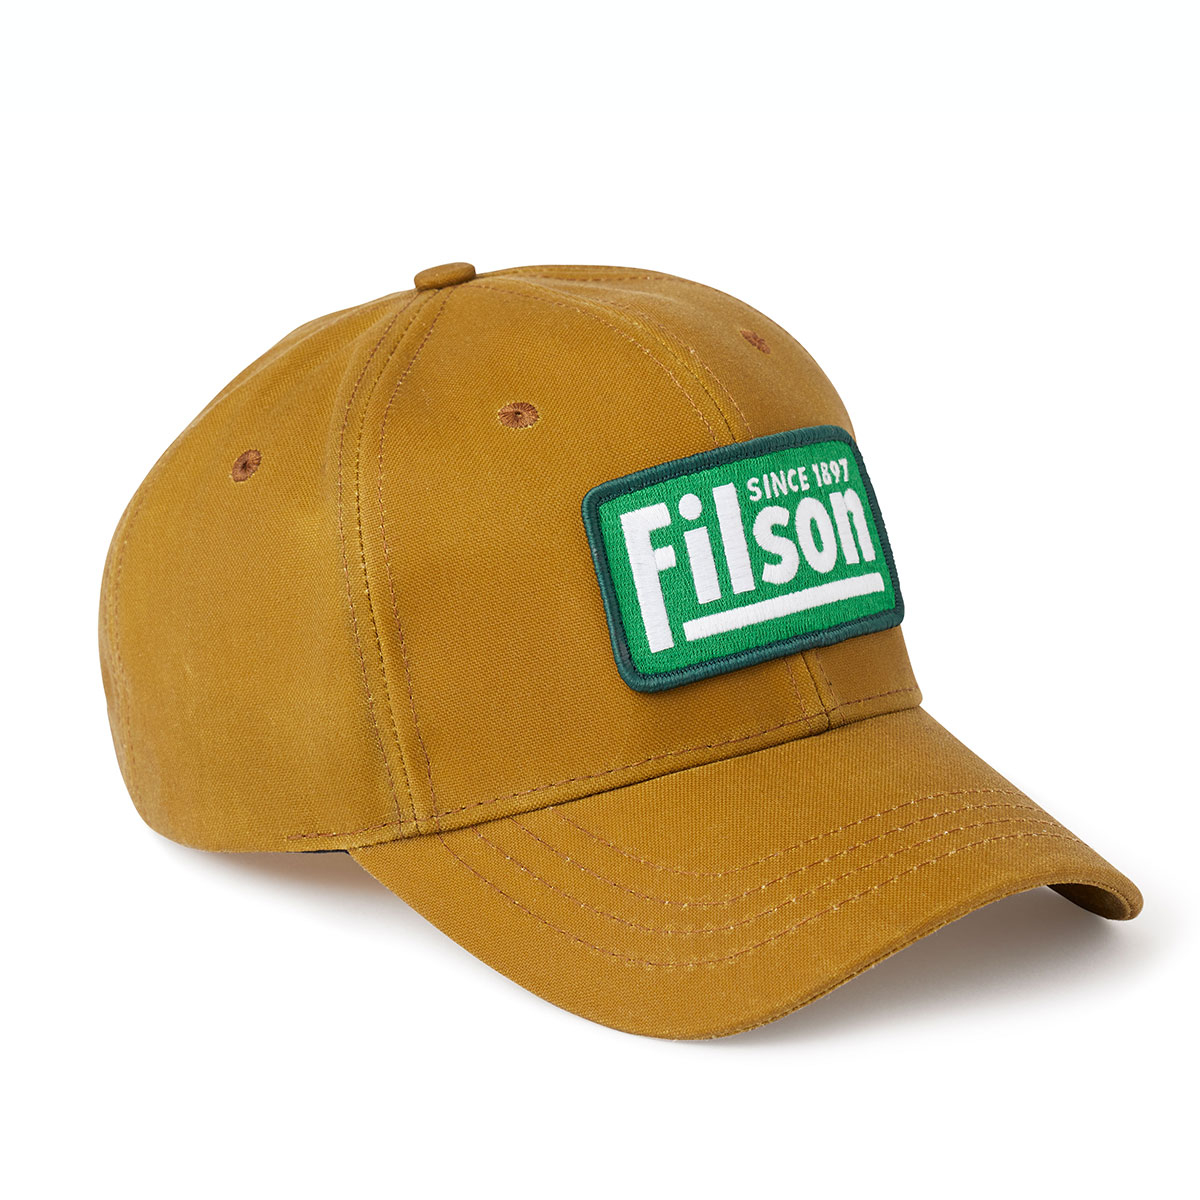 Filson Oil Tin Logger Cap Tan